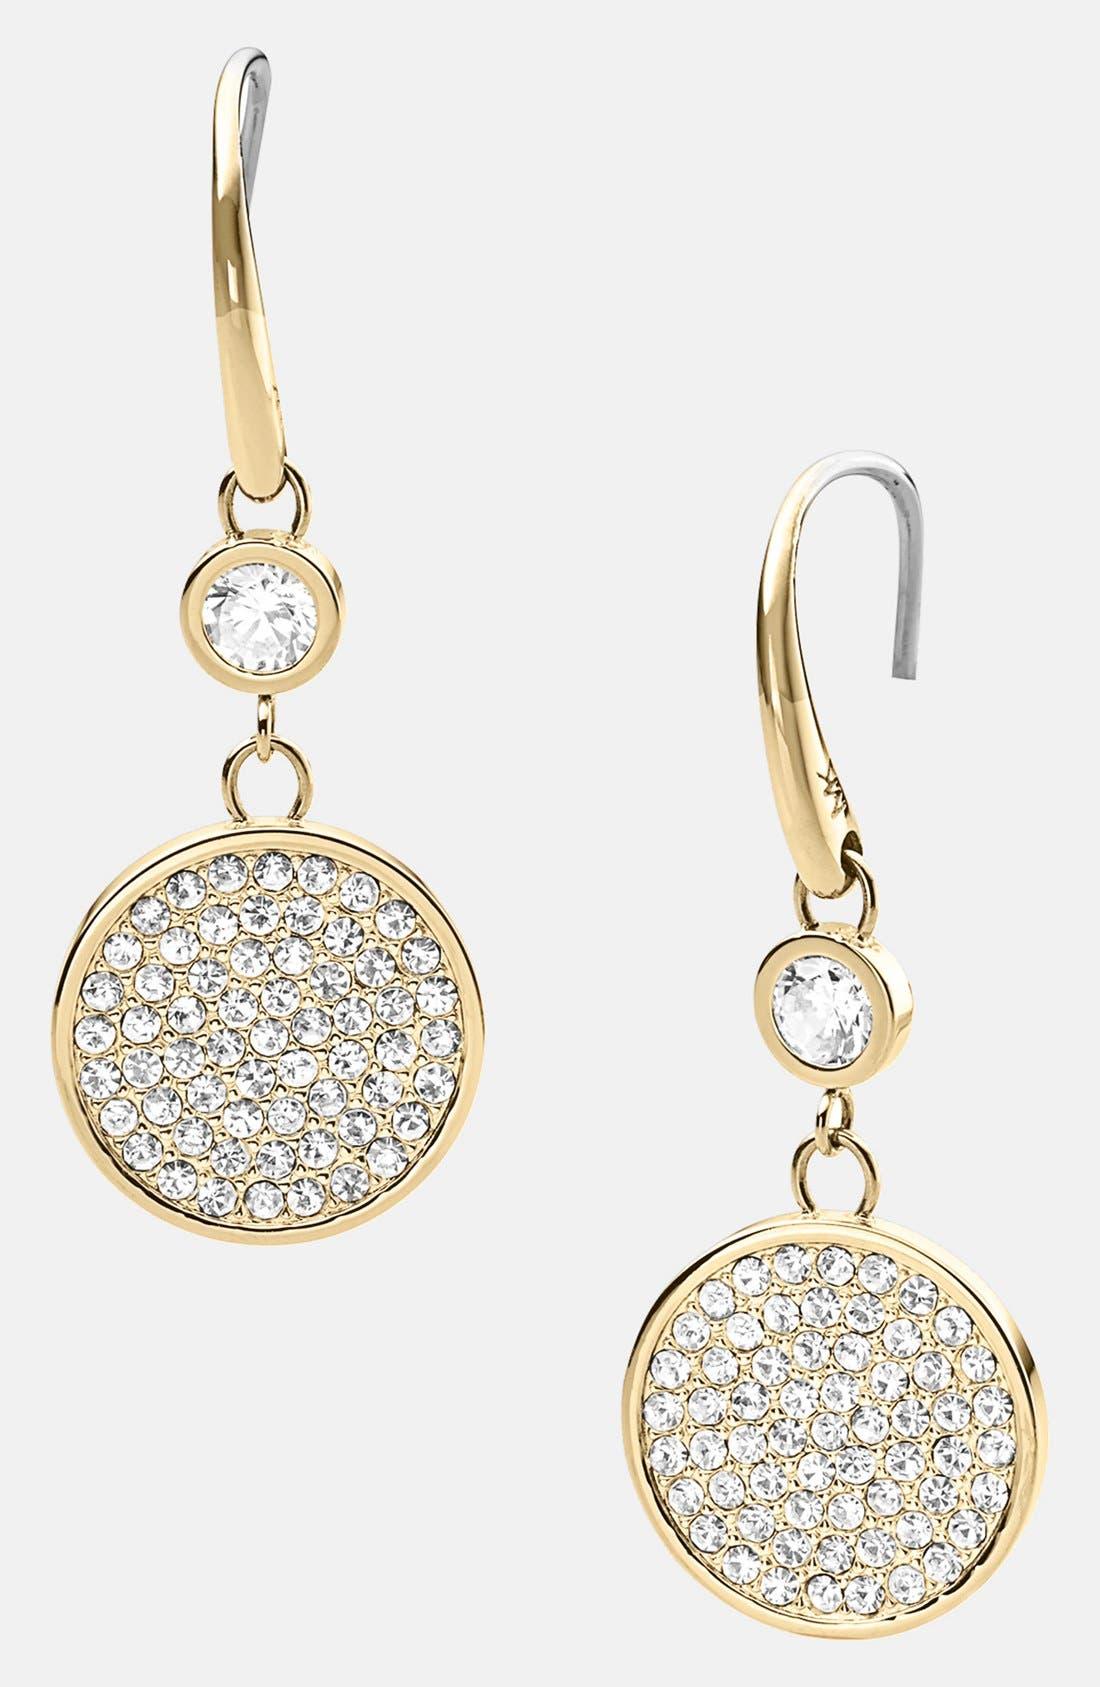 Main Image - Michael Kors 'Brilliance' Pavé Disc Drop Earrings